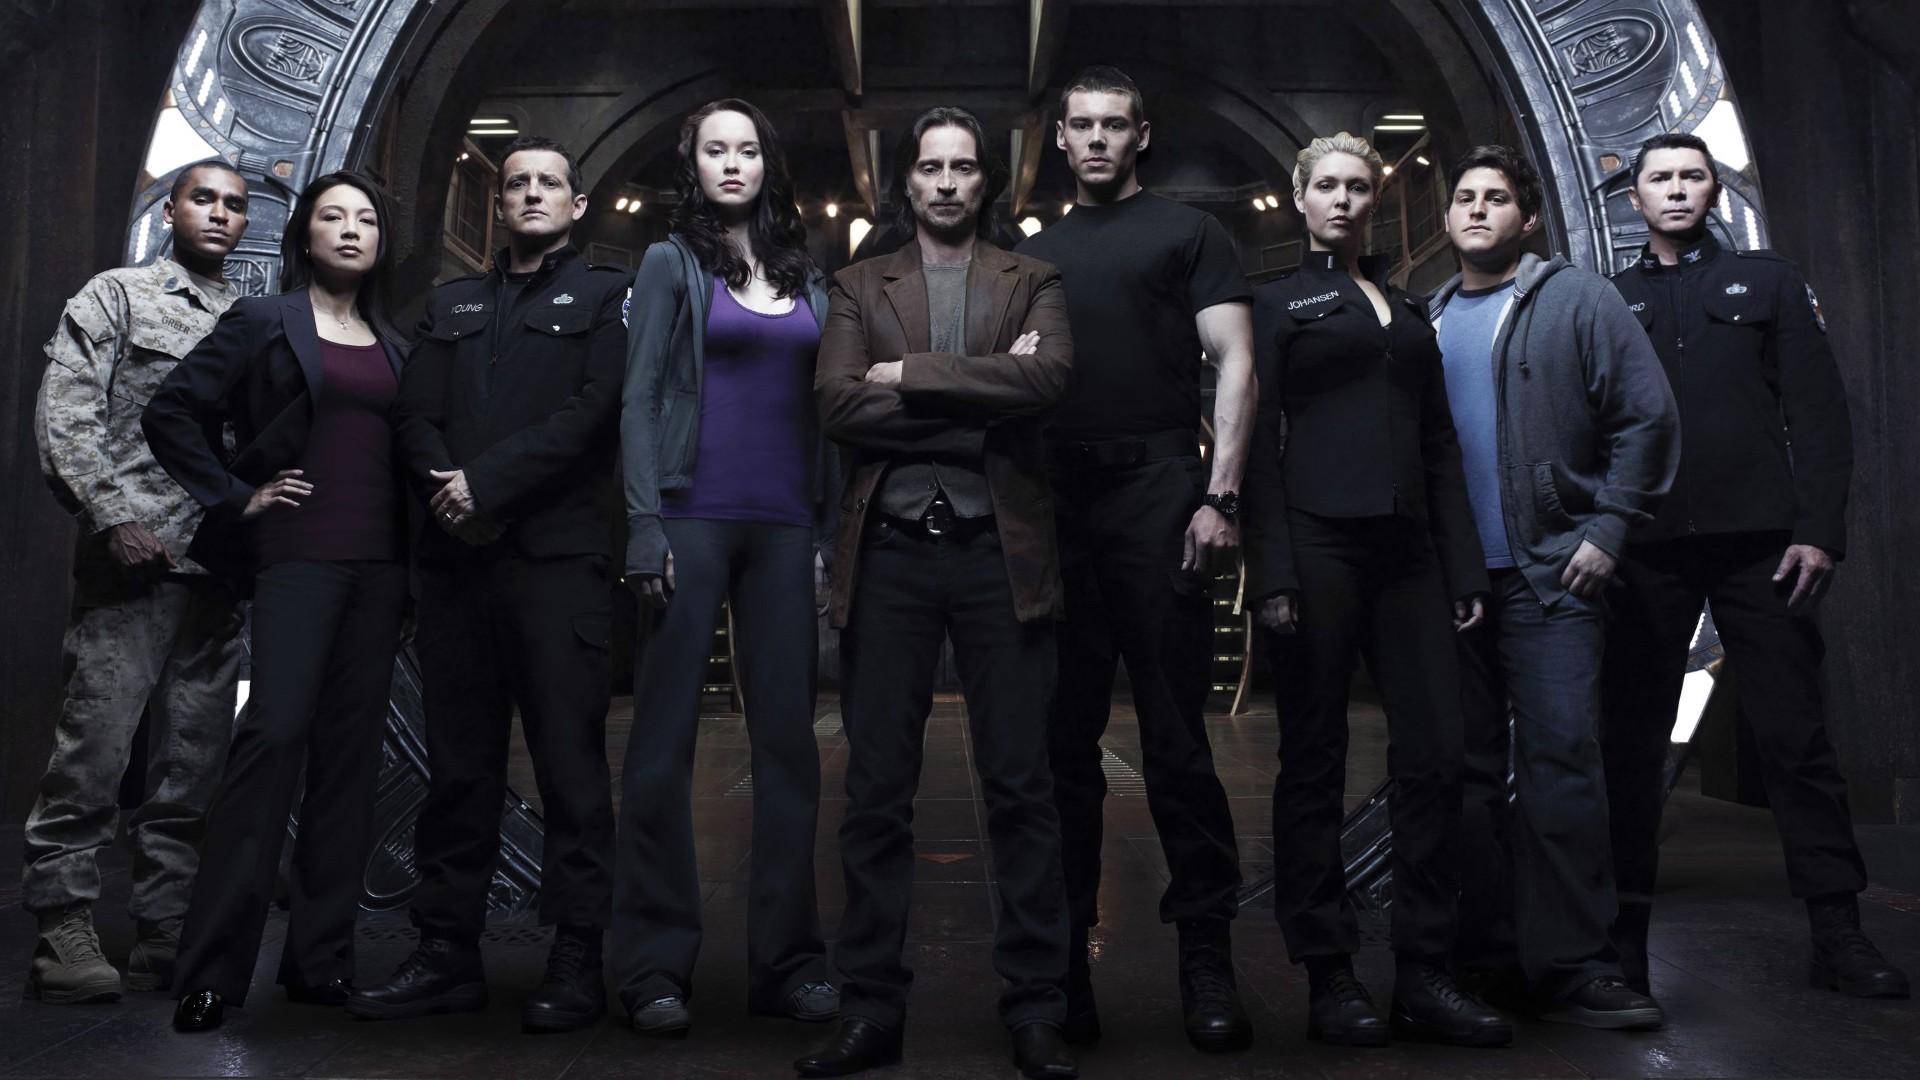 SyFy cancelt SGU Stargate Universe